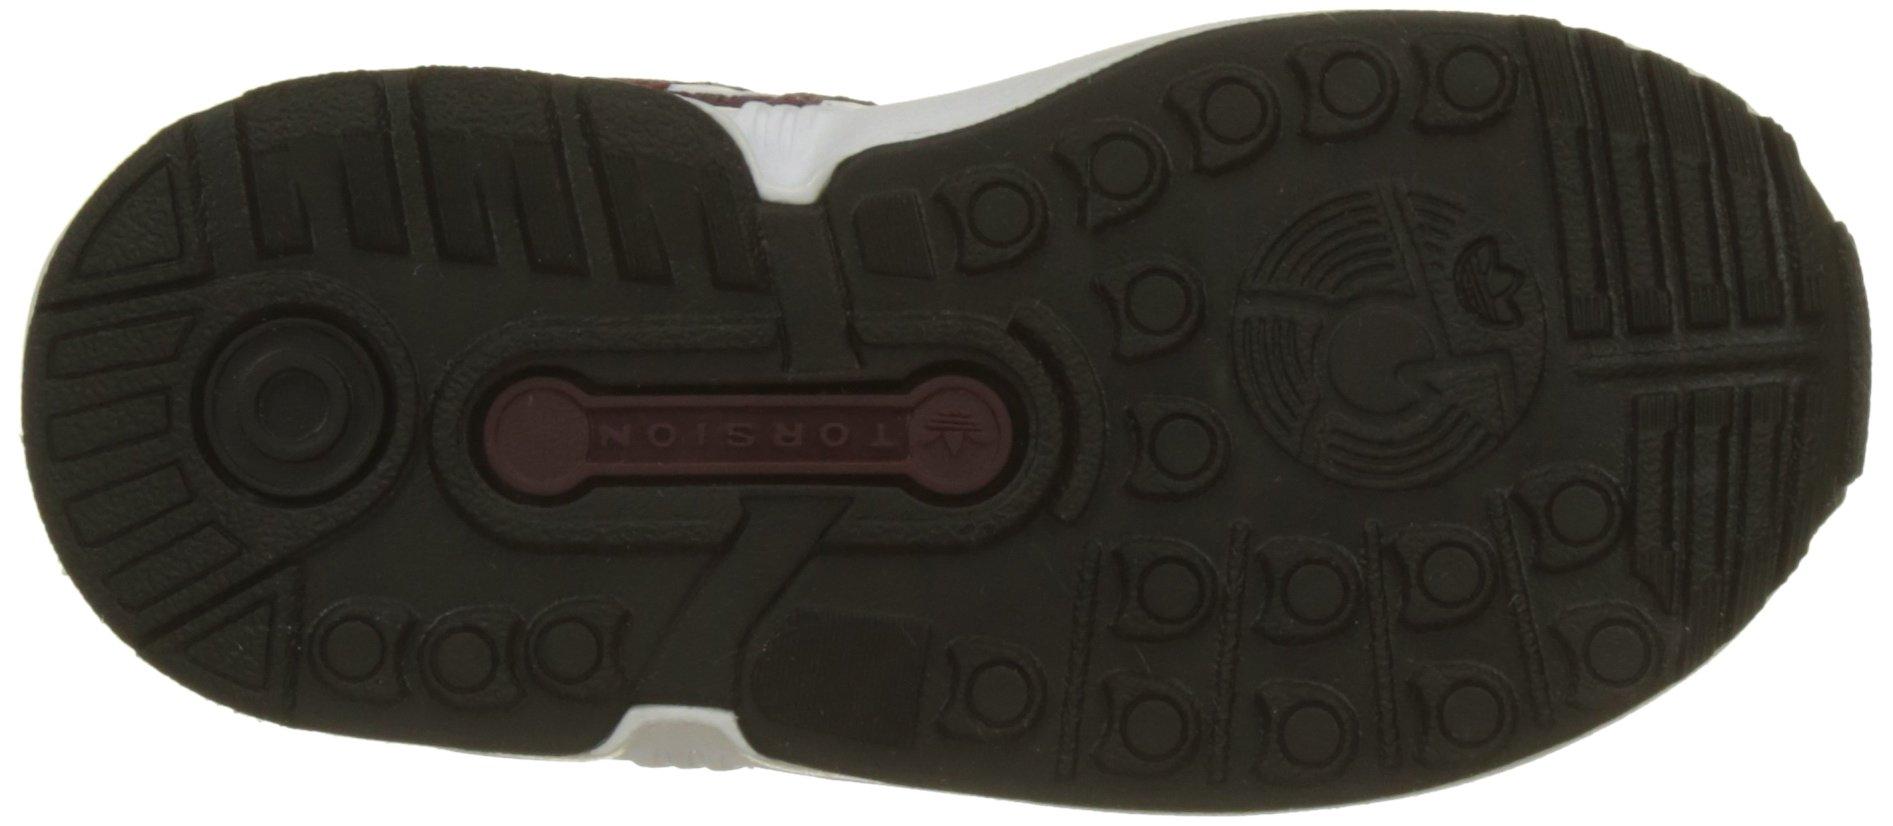 adidas ZX Flux El I, Pantofole Unisex – Bimbi 0-24 3 spesavip